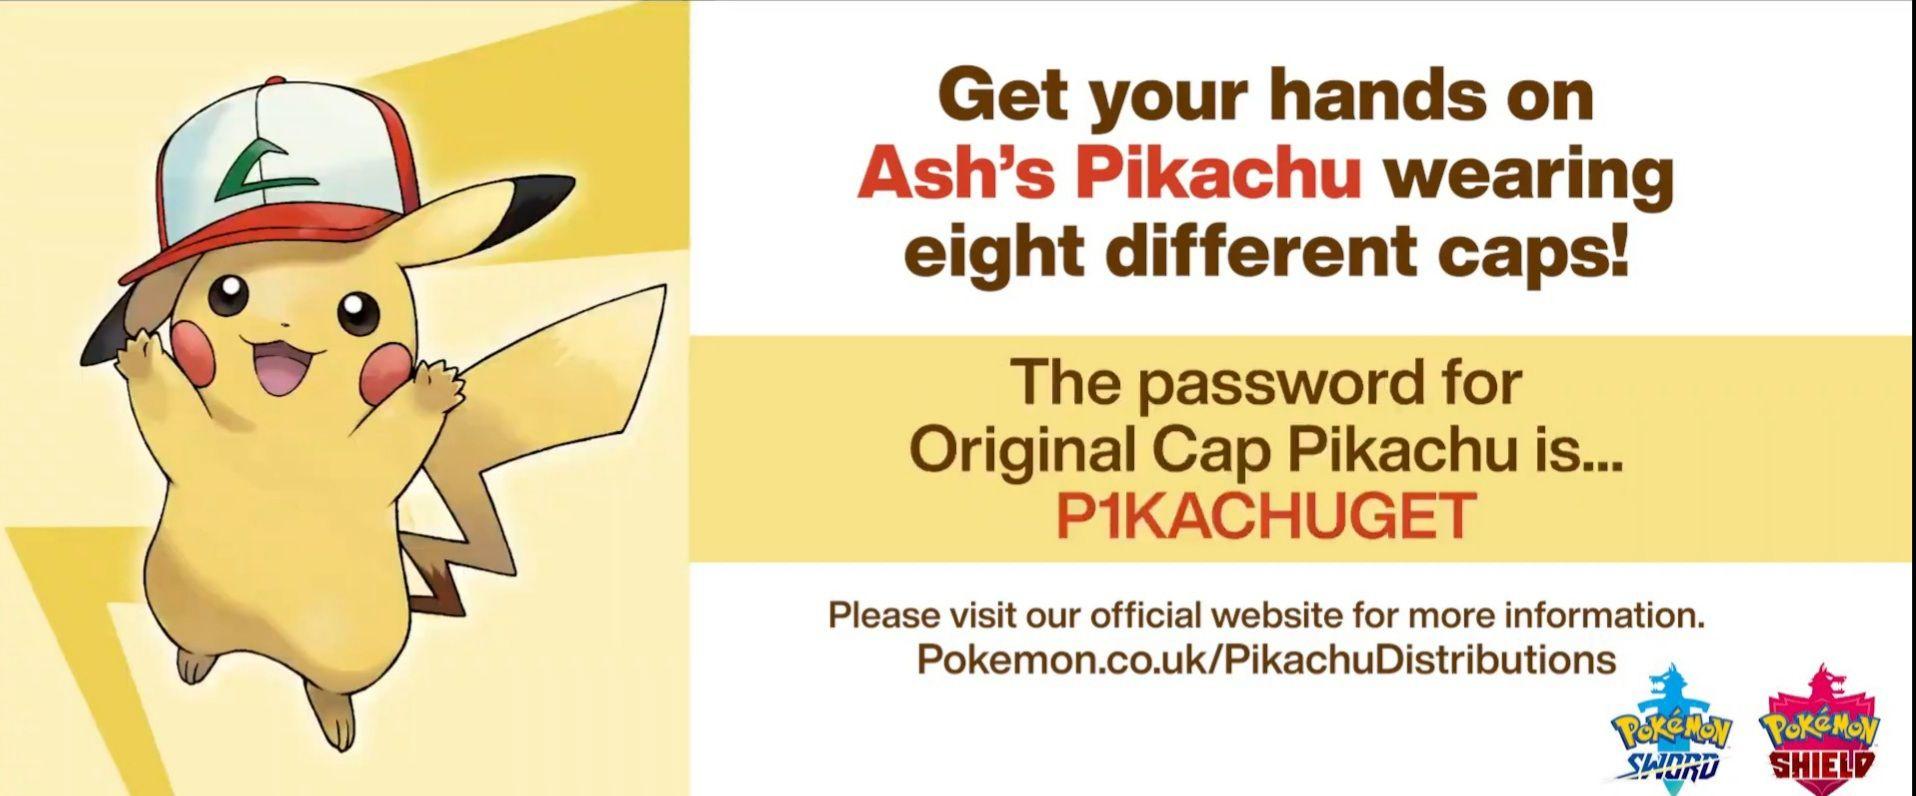 Pokémon sword and shield gratis pikachu met ash pet